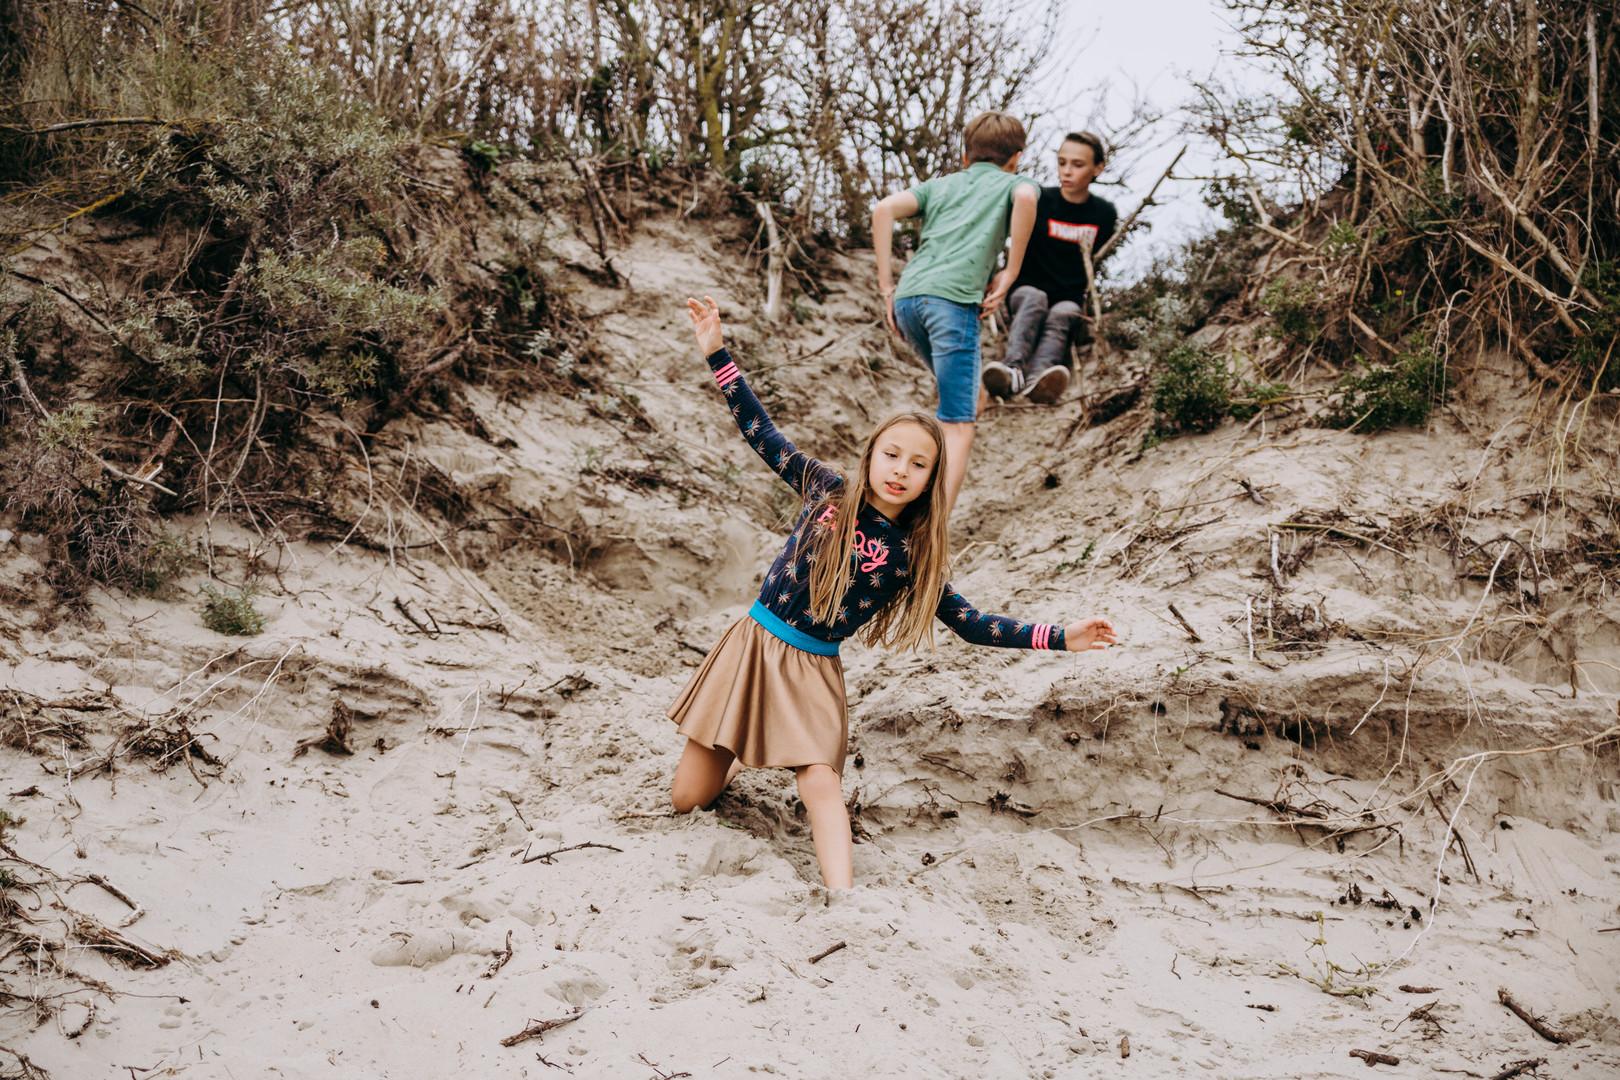 super gezellige familie lifestyle fotoshoot op het strand en duien